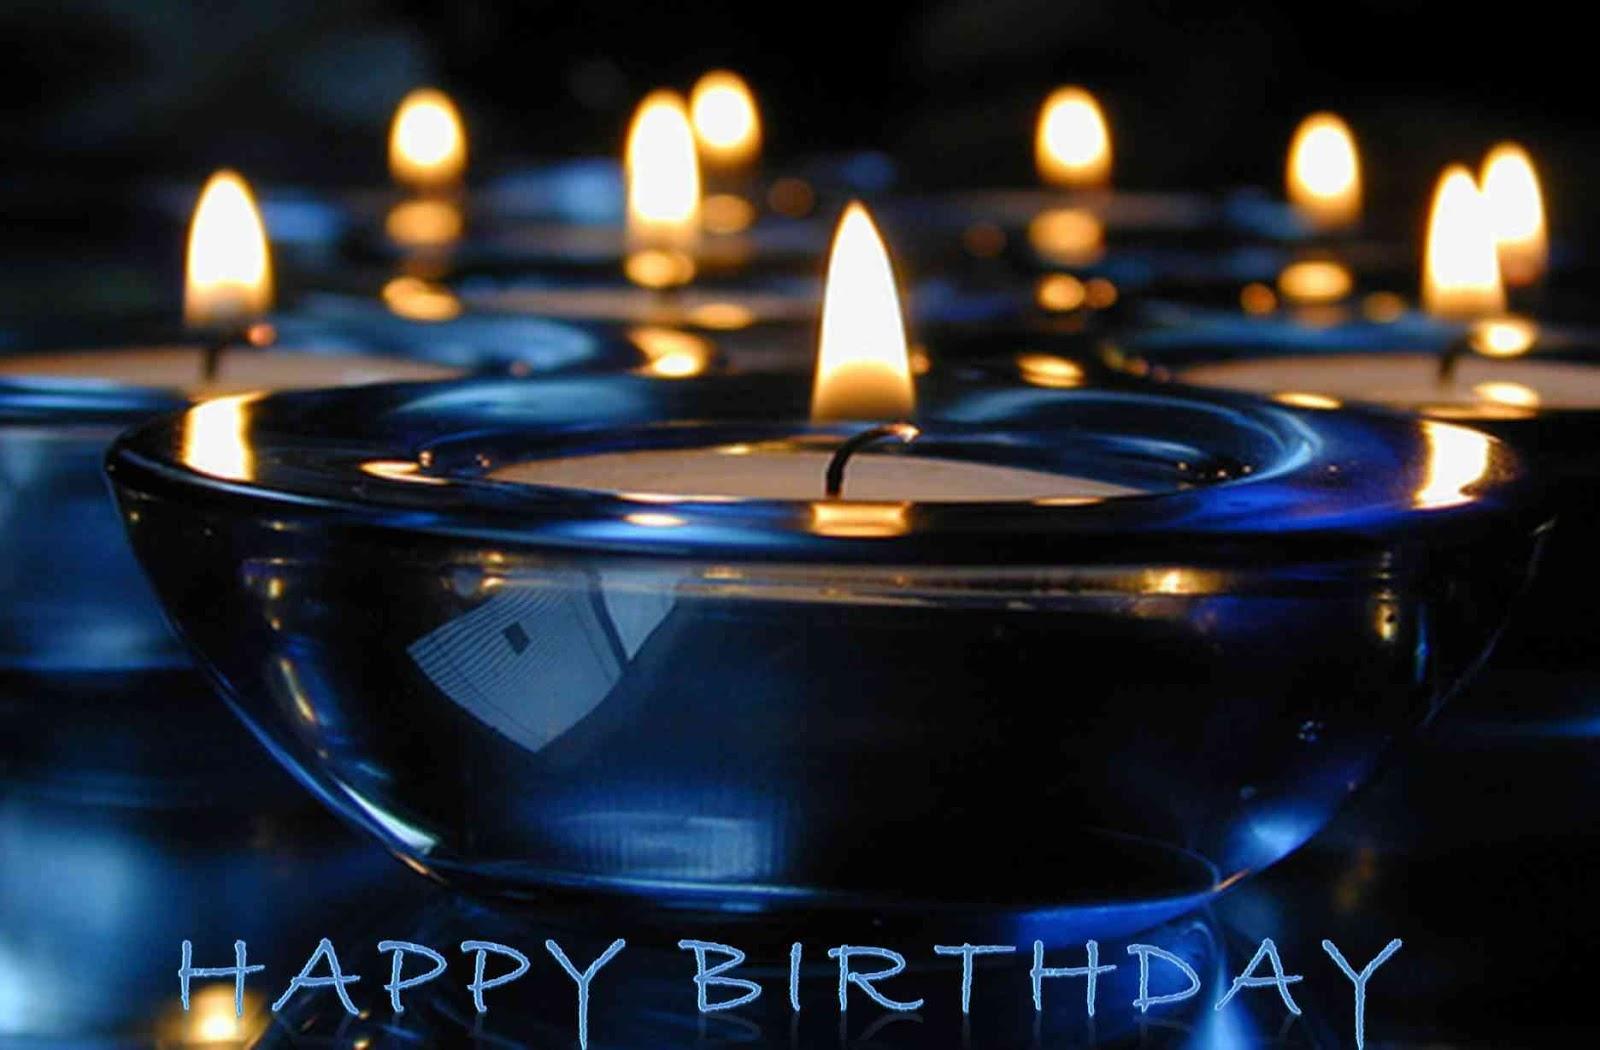 Happy Birthday Images HD Wallpaper